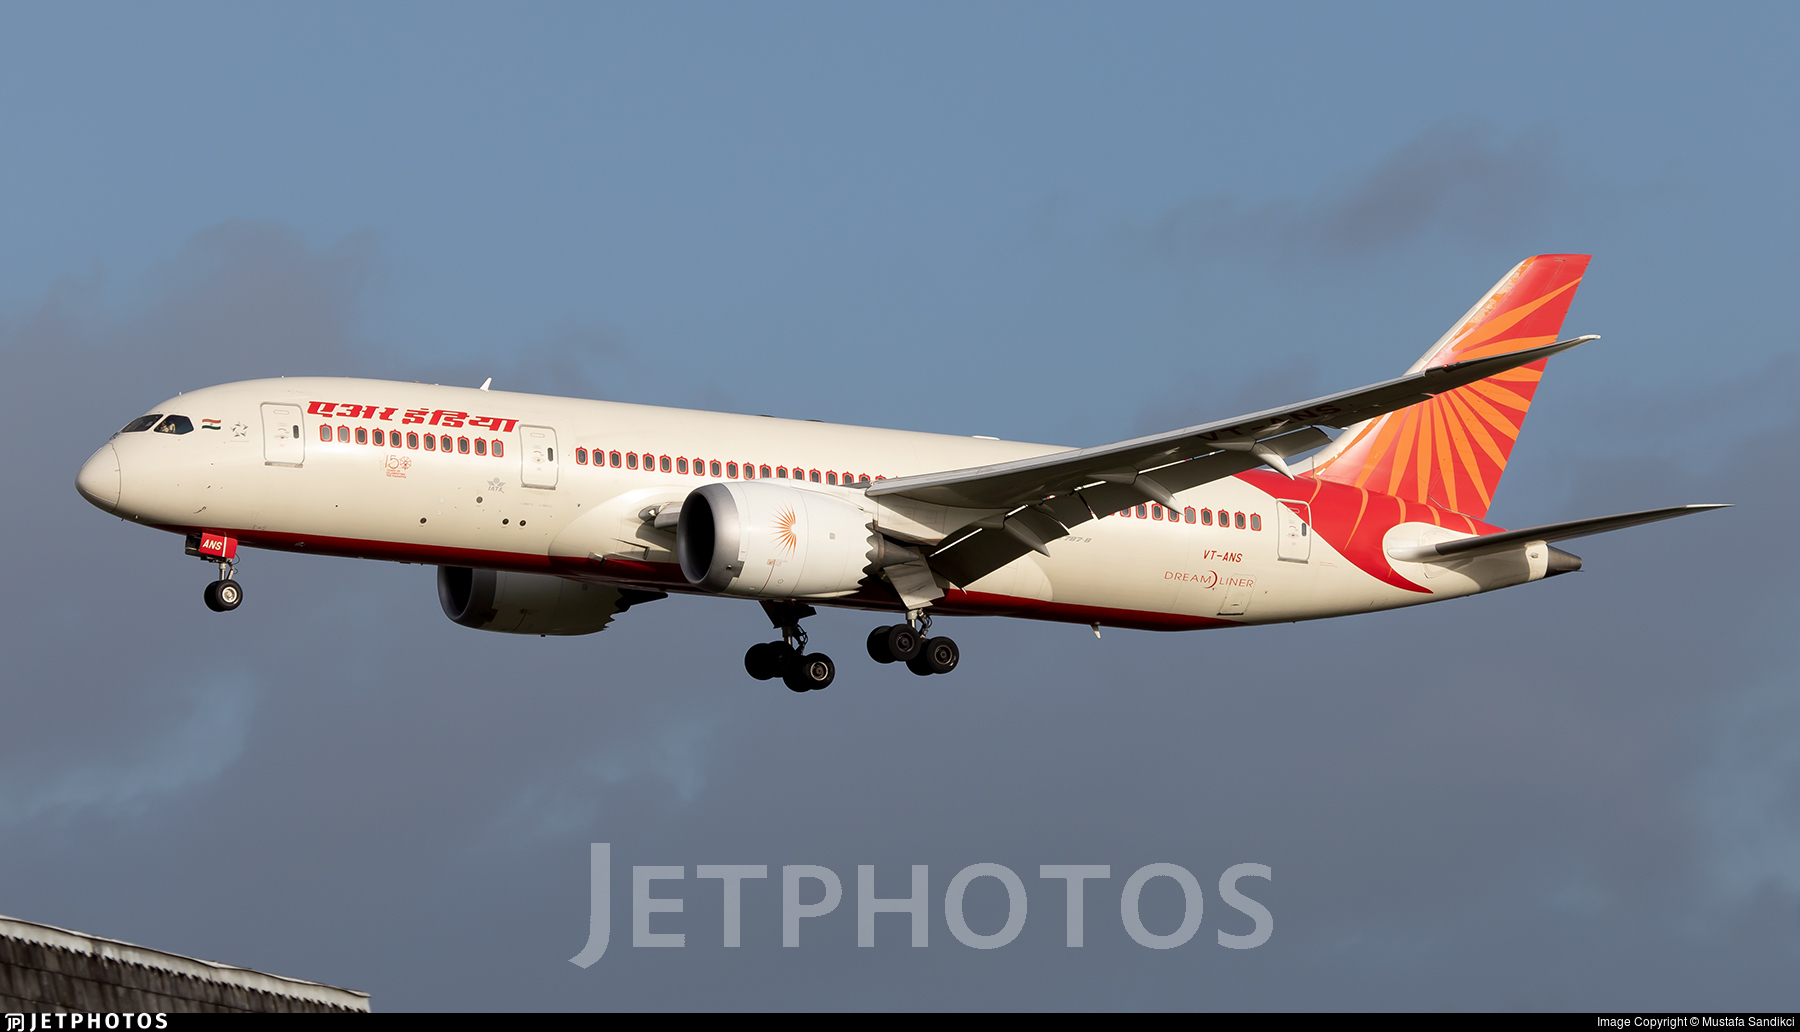 VT-ANS - Boeing 787-8 Dreamliner - Air India